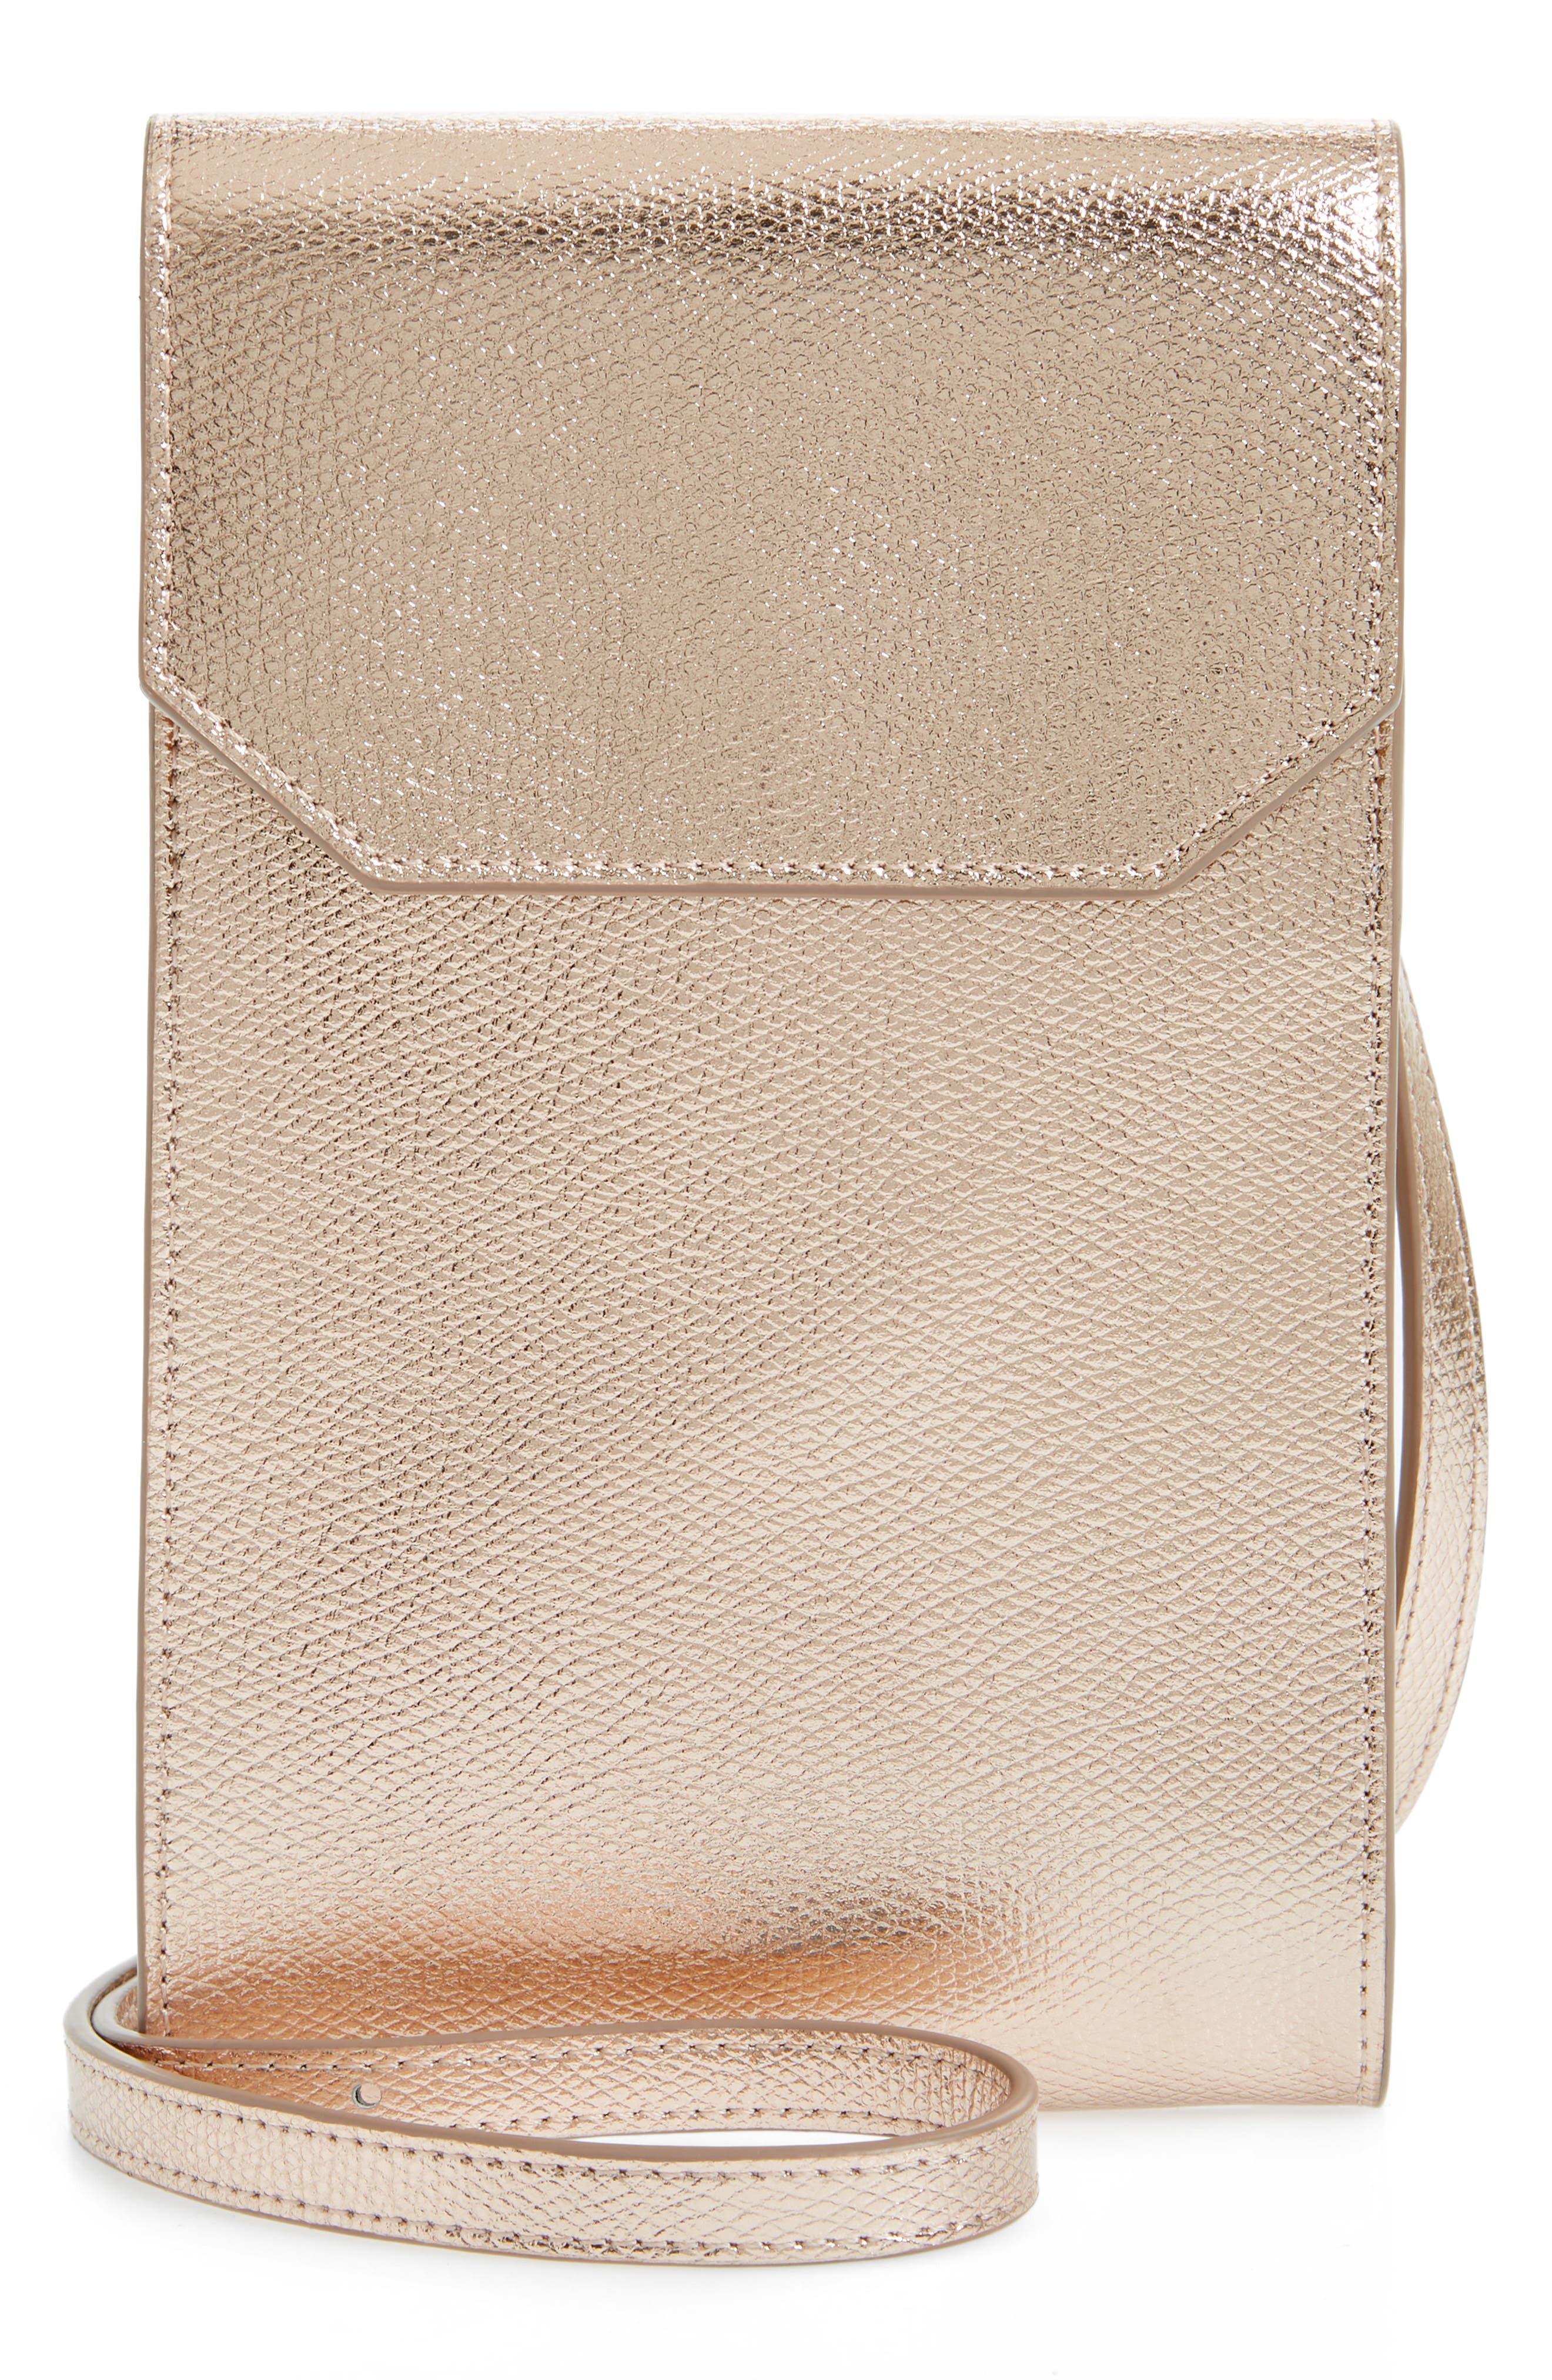 Metallic Leather Phone Crossbody Bag,                         Main,                         color, 220